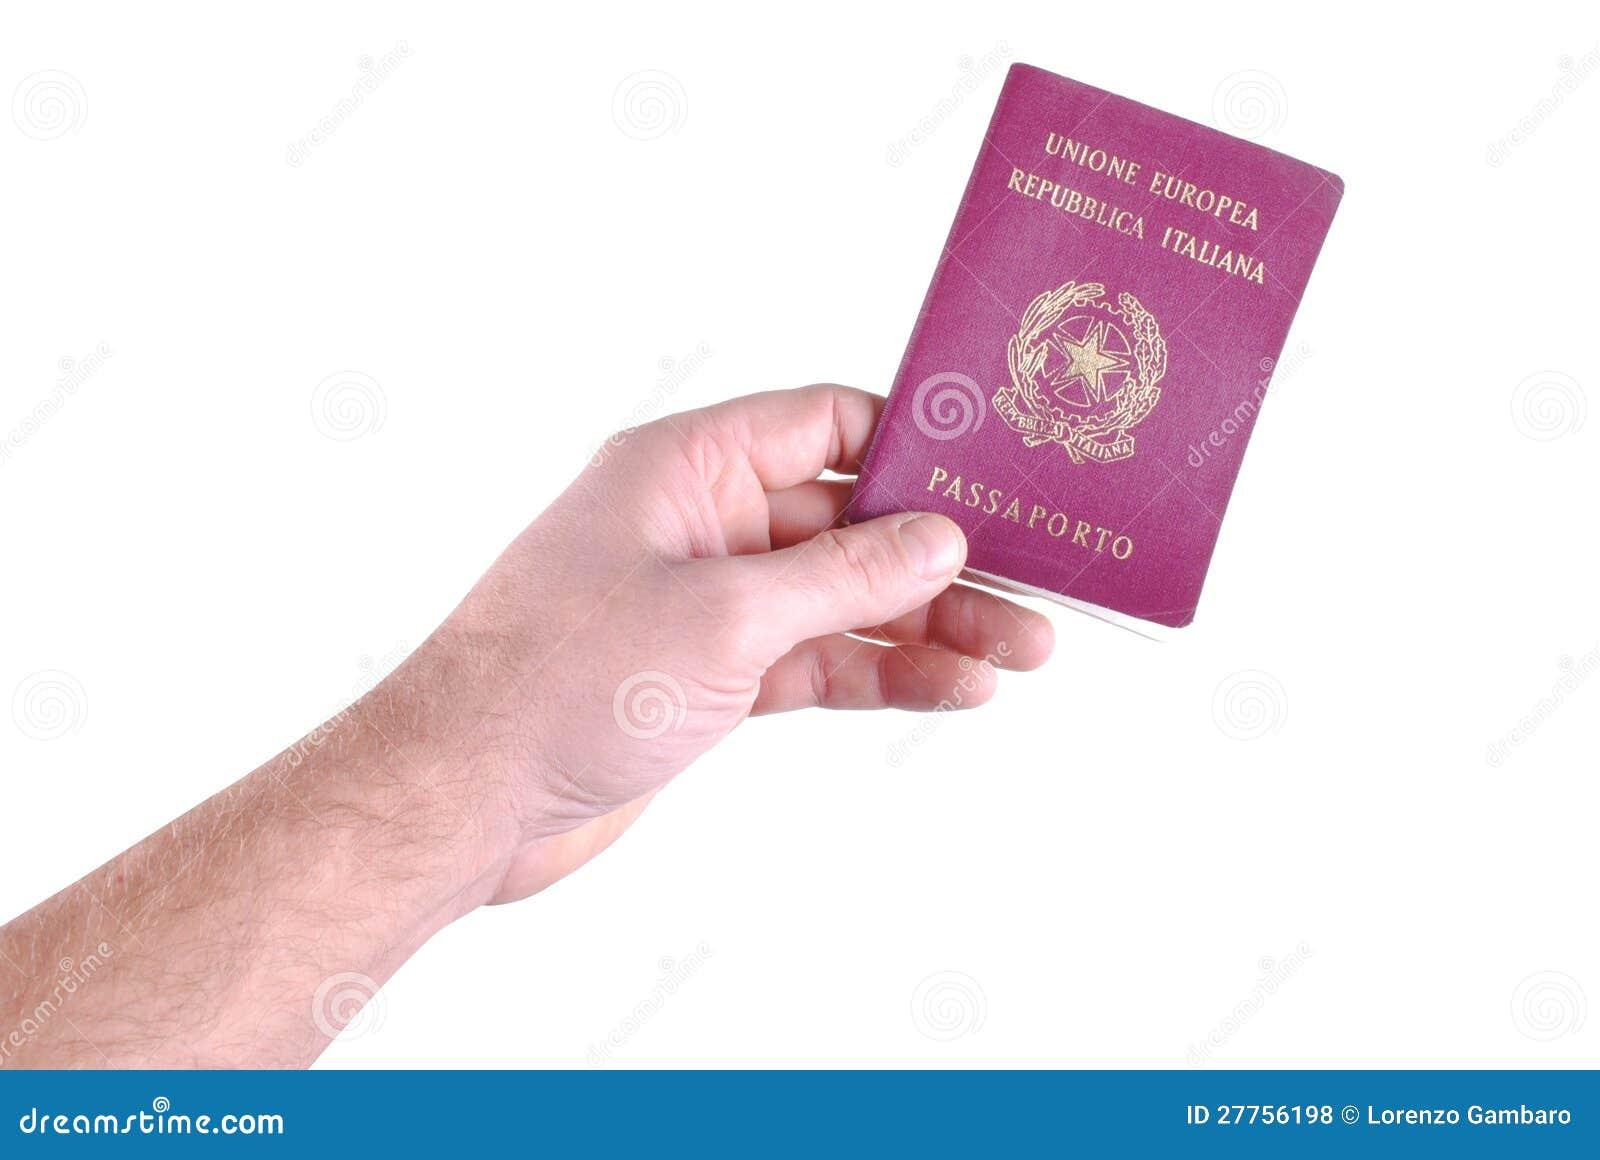 La main d homme retient un passeport italien